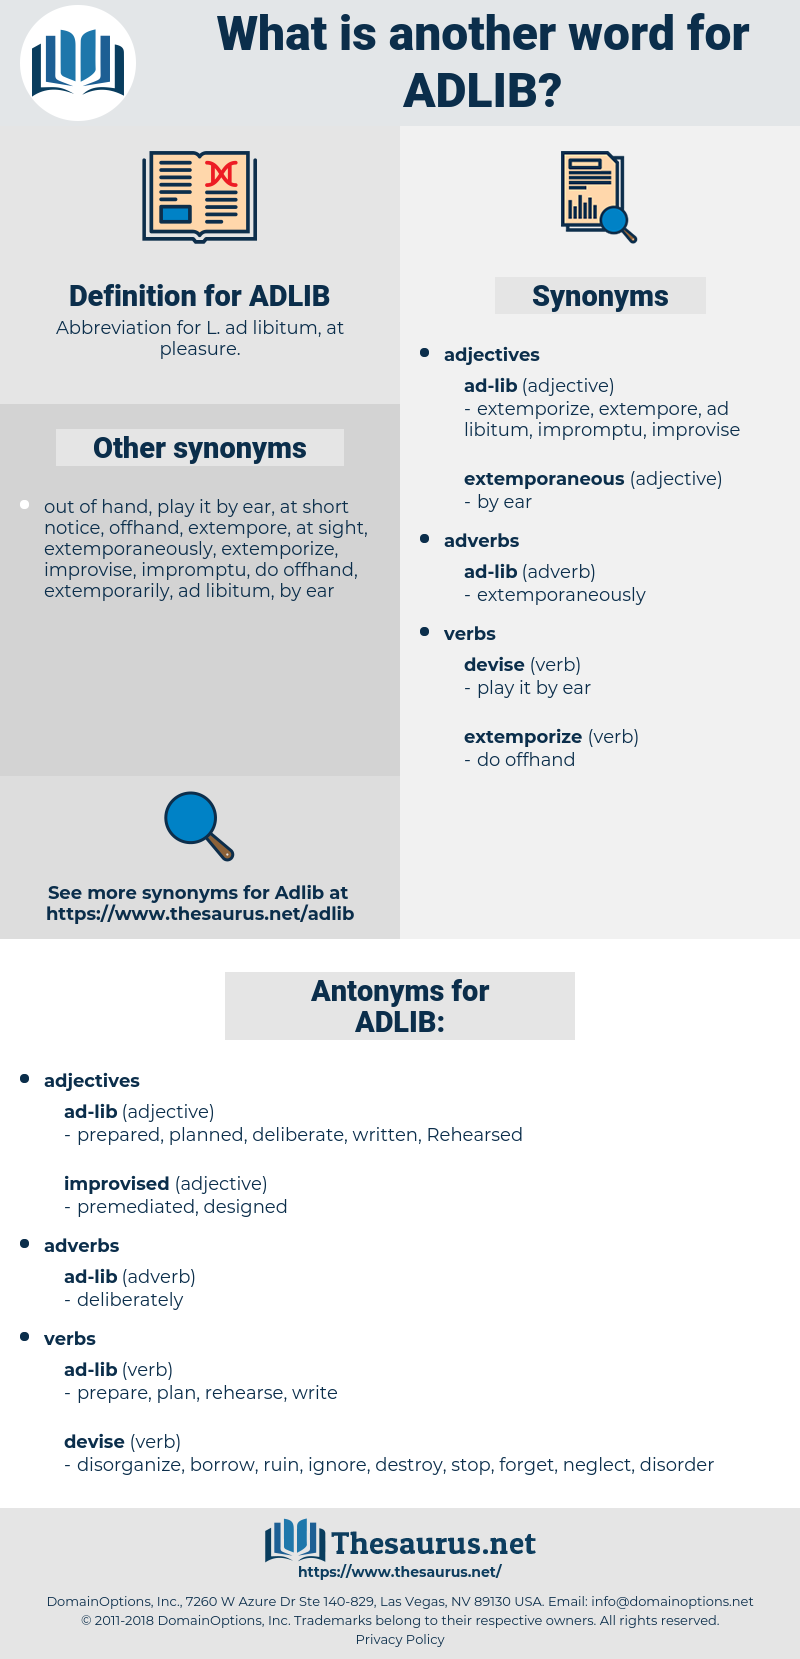 ADLIB, synonym ADLIB, another word for ADLIB, words like ADLIB, thesaurus ADLIB